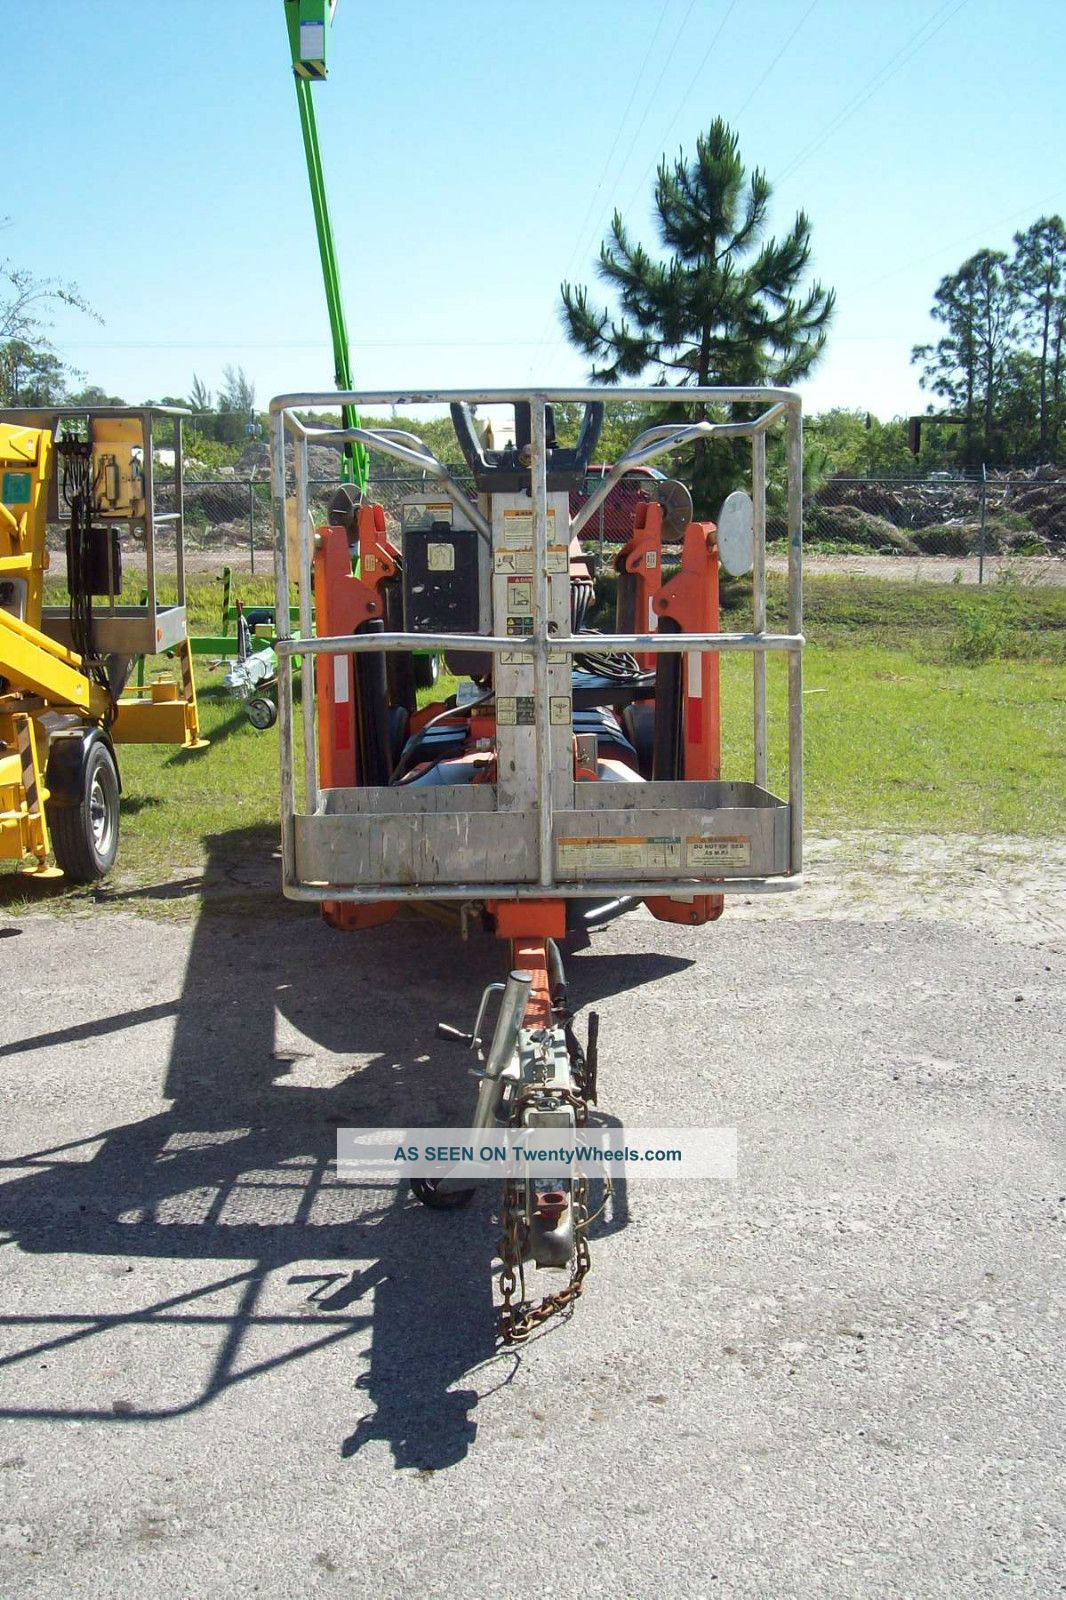 Battery Bucket Lift : Jlg t boom lift auto leveling battery powered